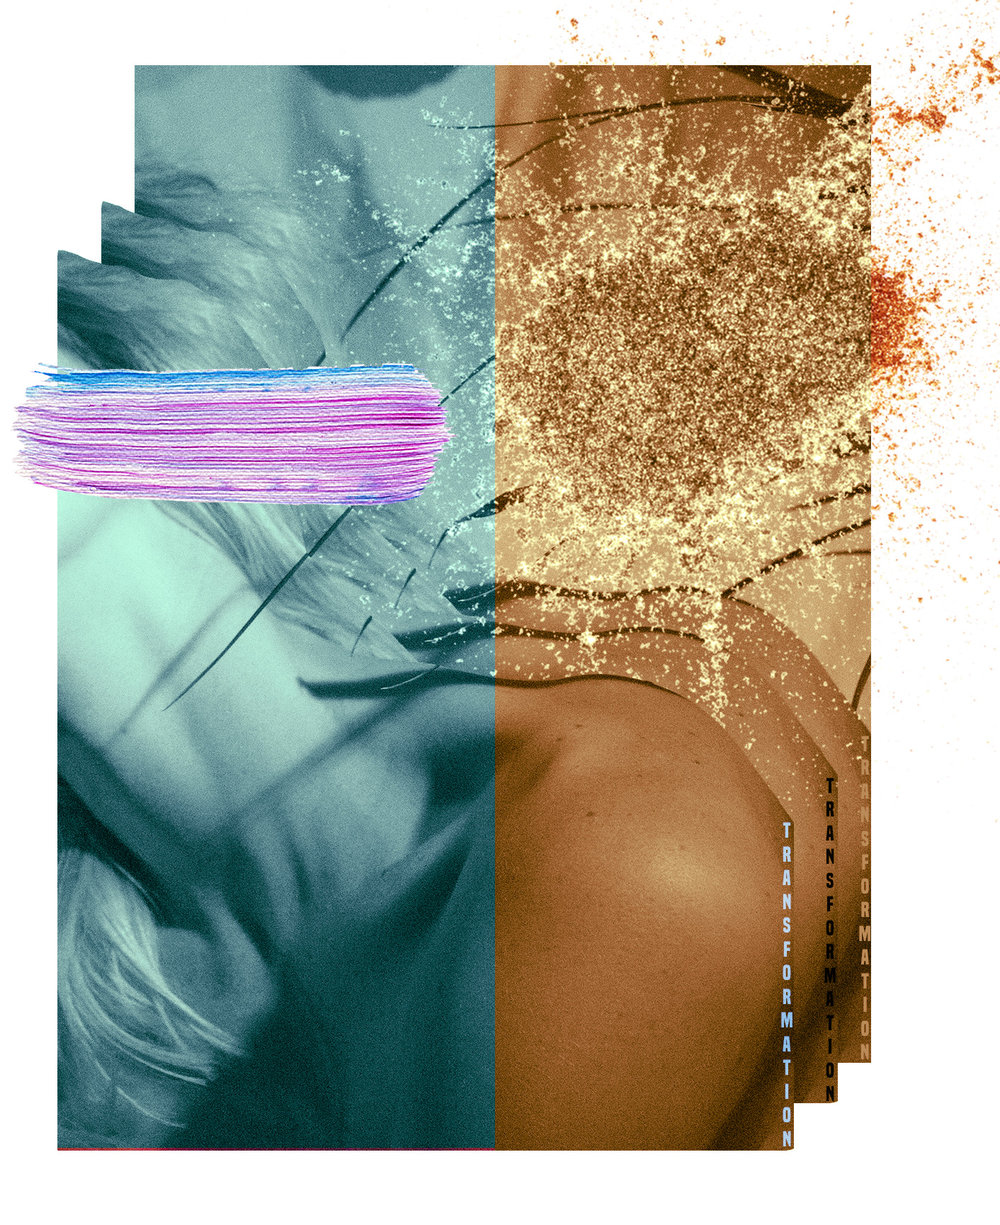 digitaldesign_alifutrell.jpg